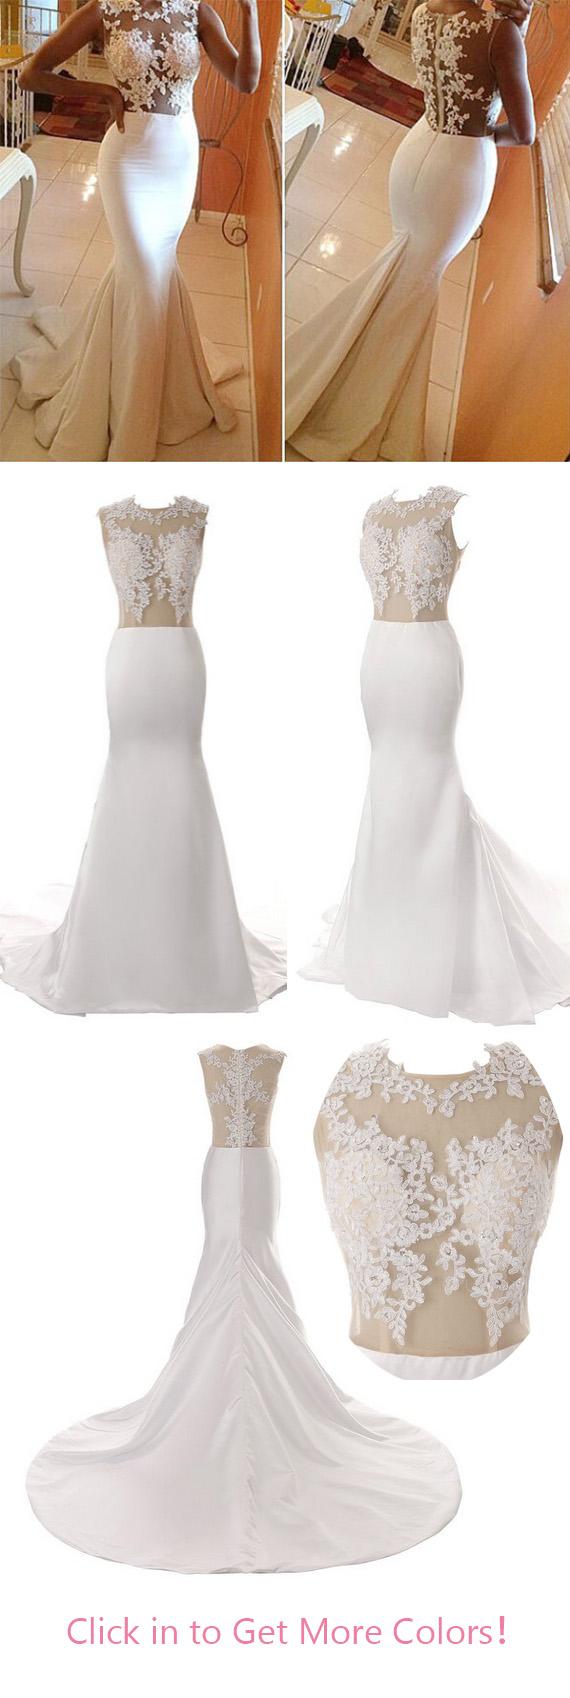 Prom dress saleinexpensive prom dressescheap prom dresses under